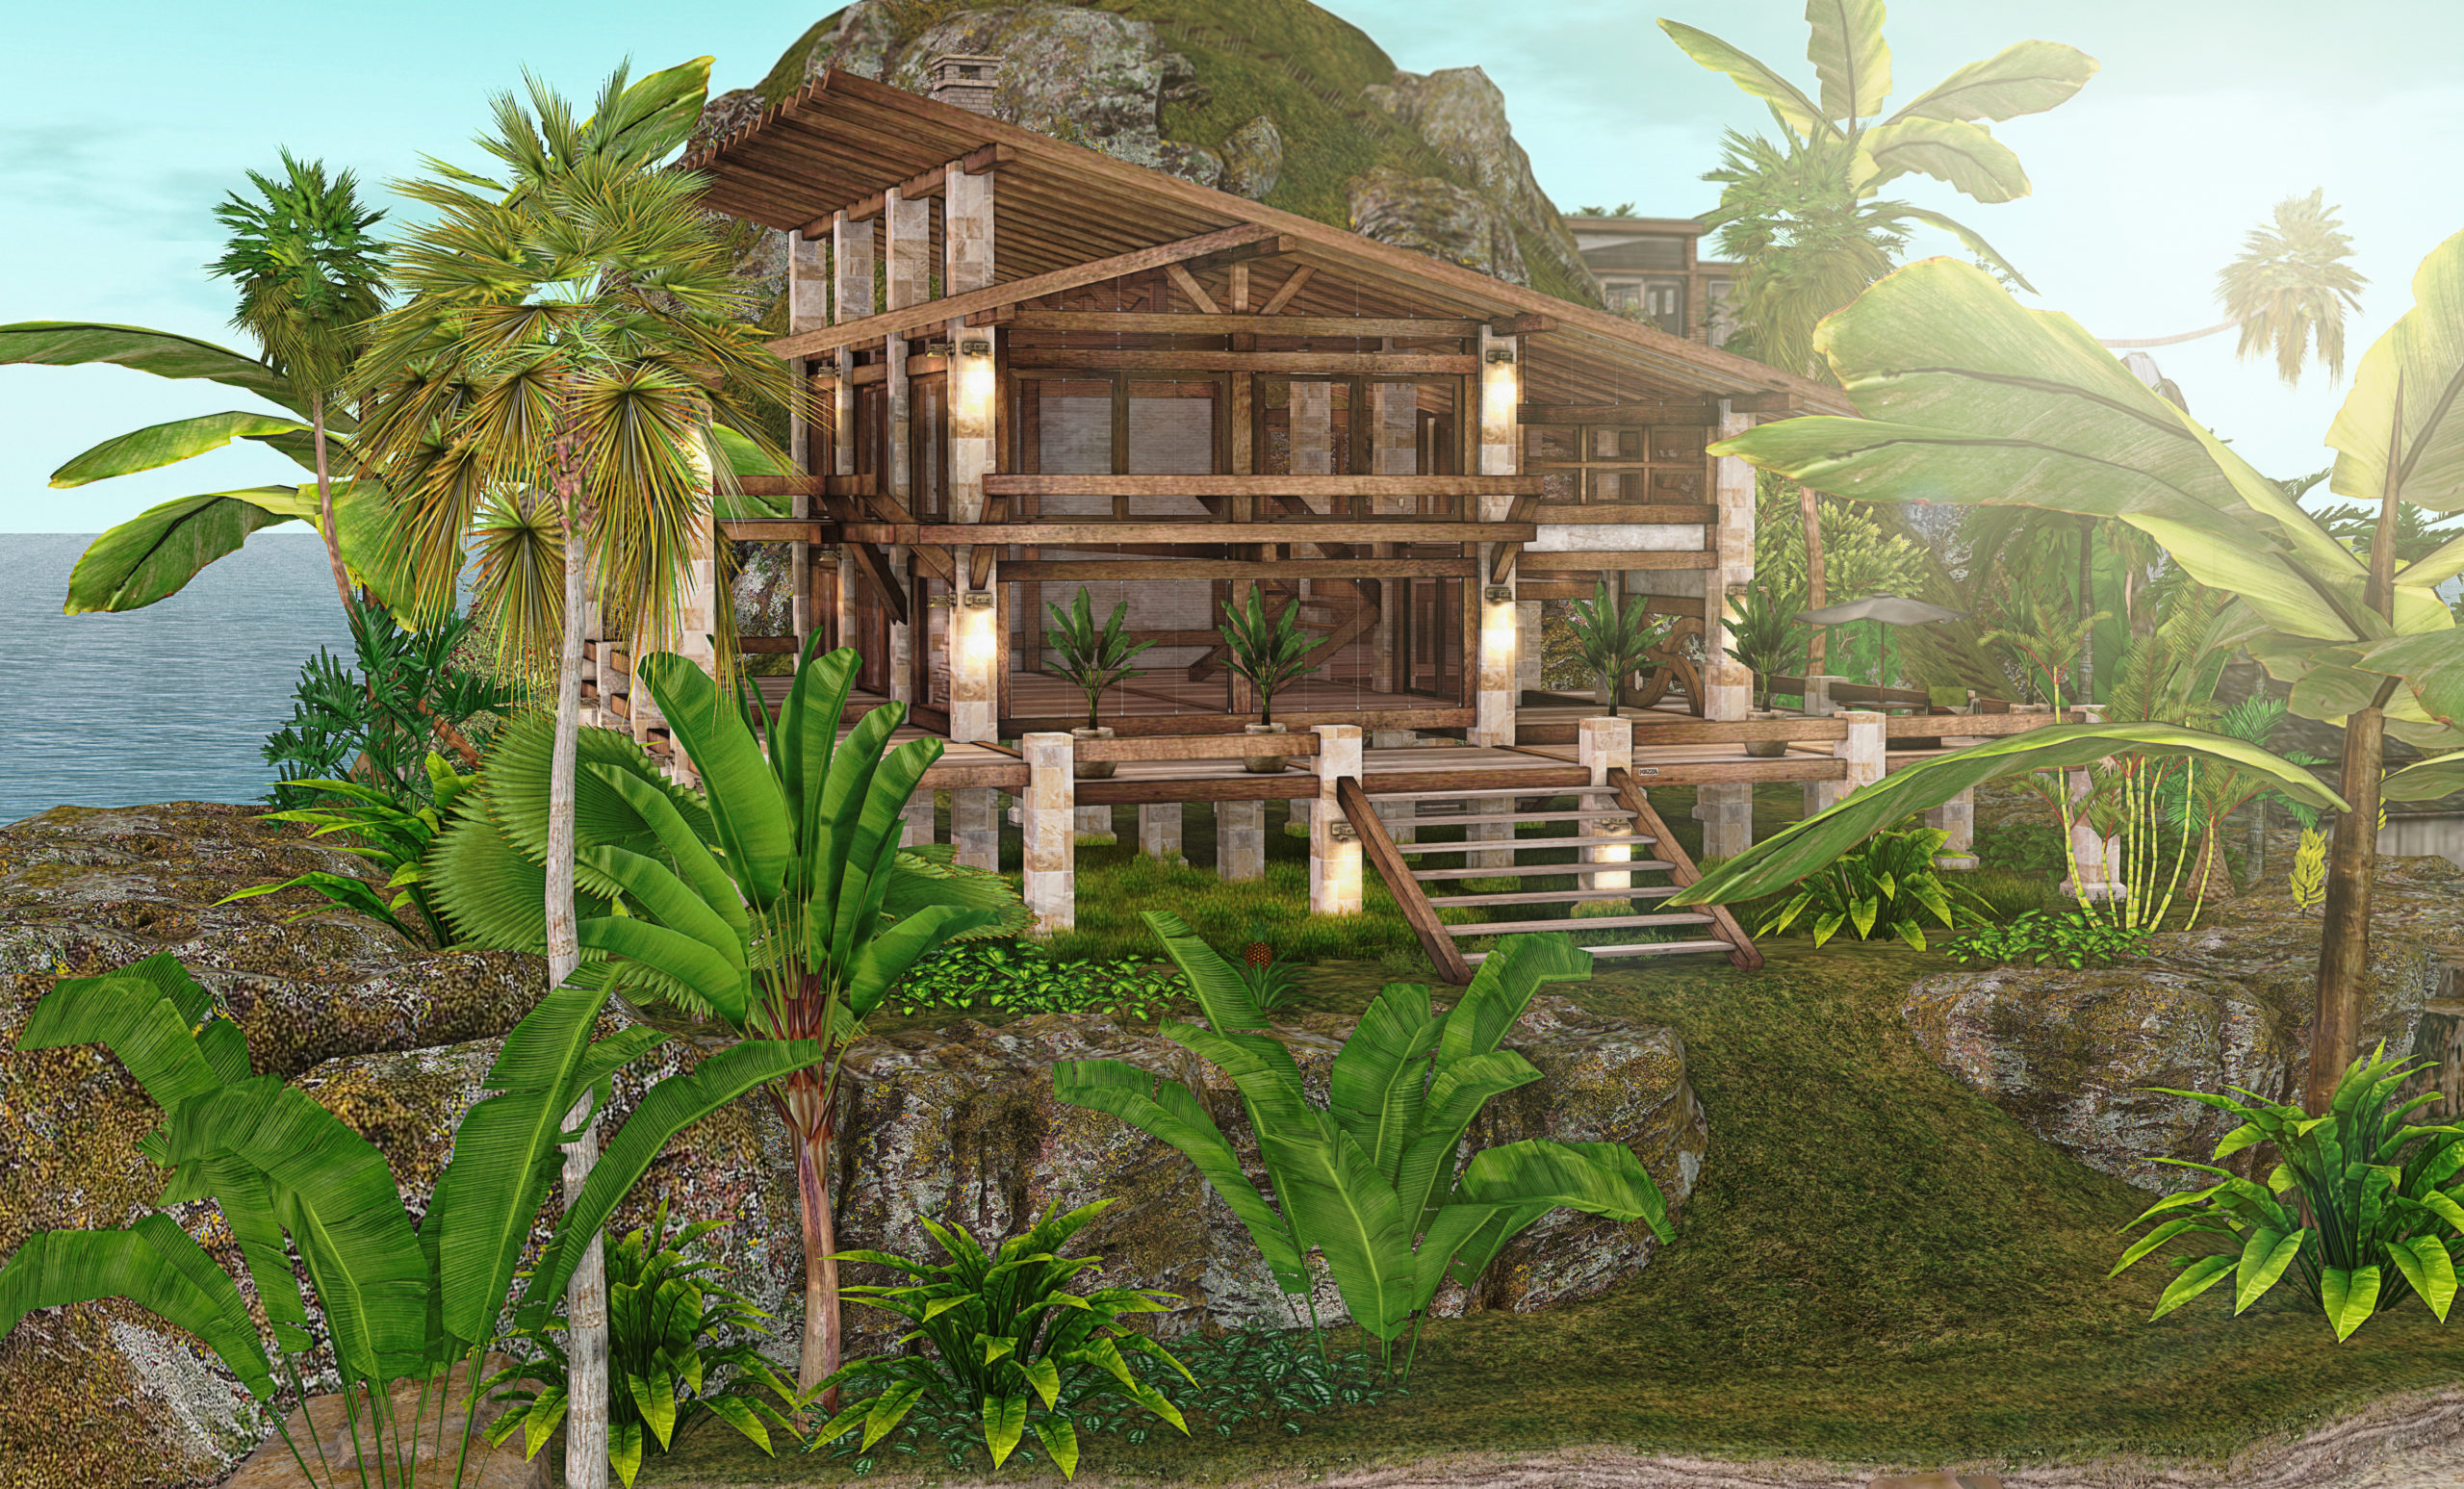 SunshineBeachHouse